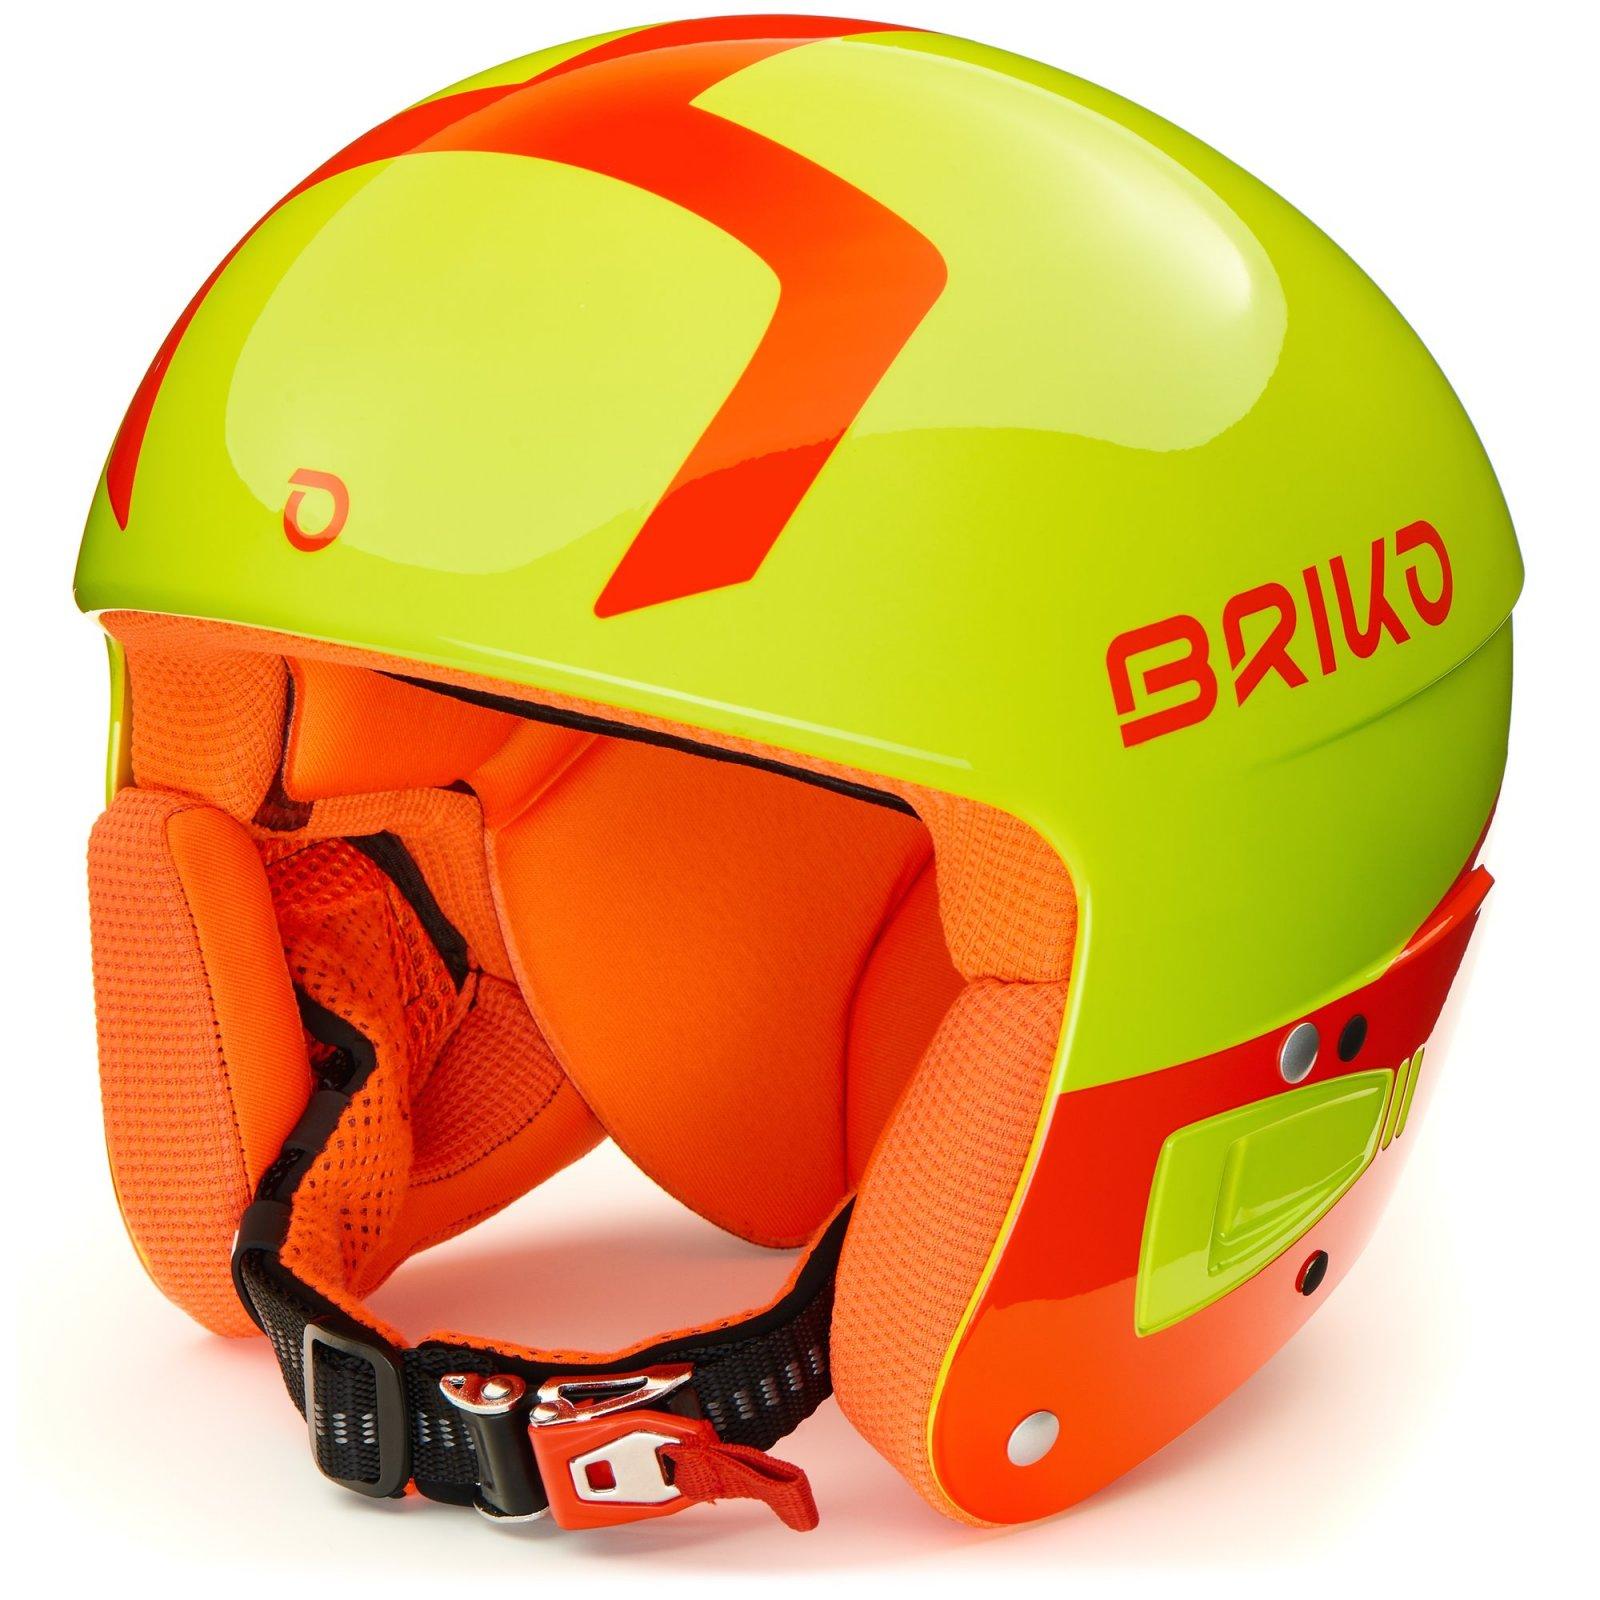 Briko 19 Vulcano FIS 6.8 Junior EPS Helmet